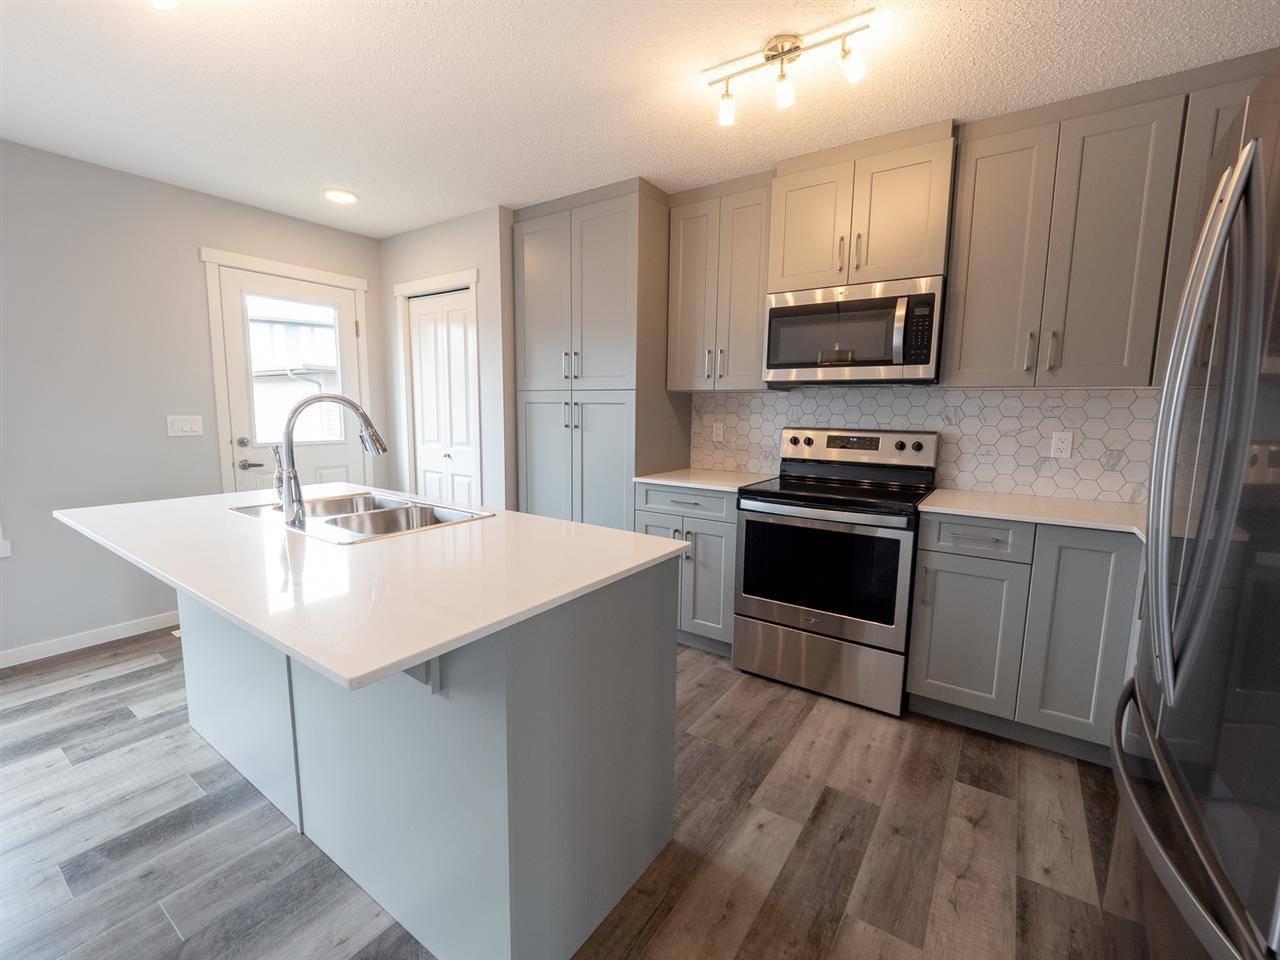 House for sale at 5359 Admiral Girouard St Nw Edmonton Alberta - MLS: E4187614